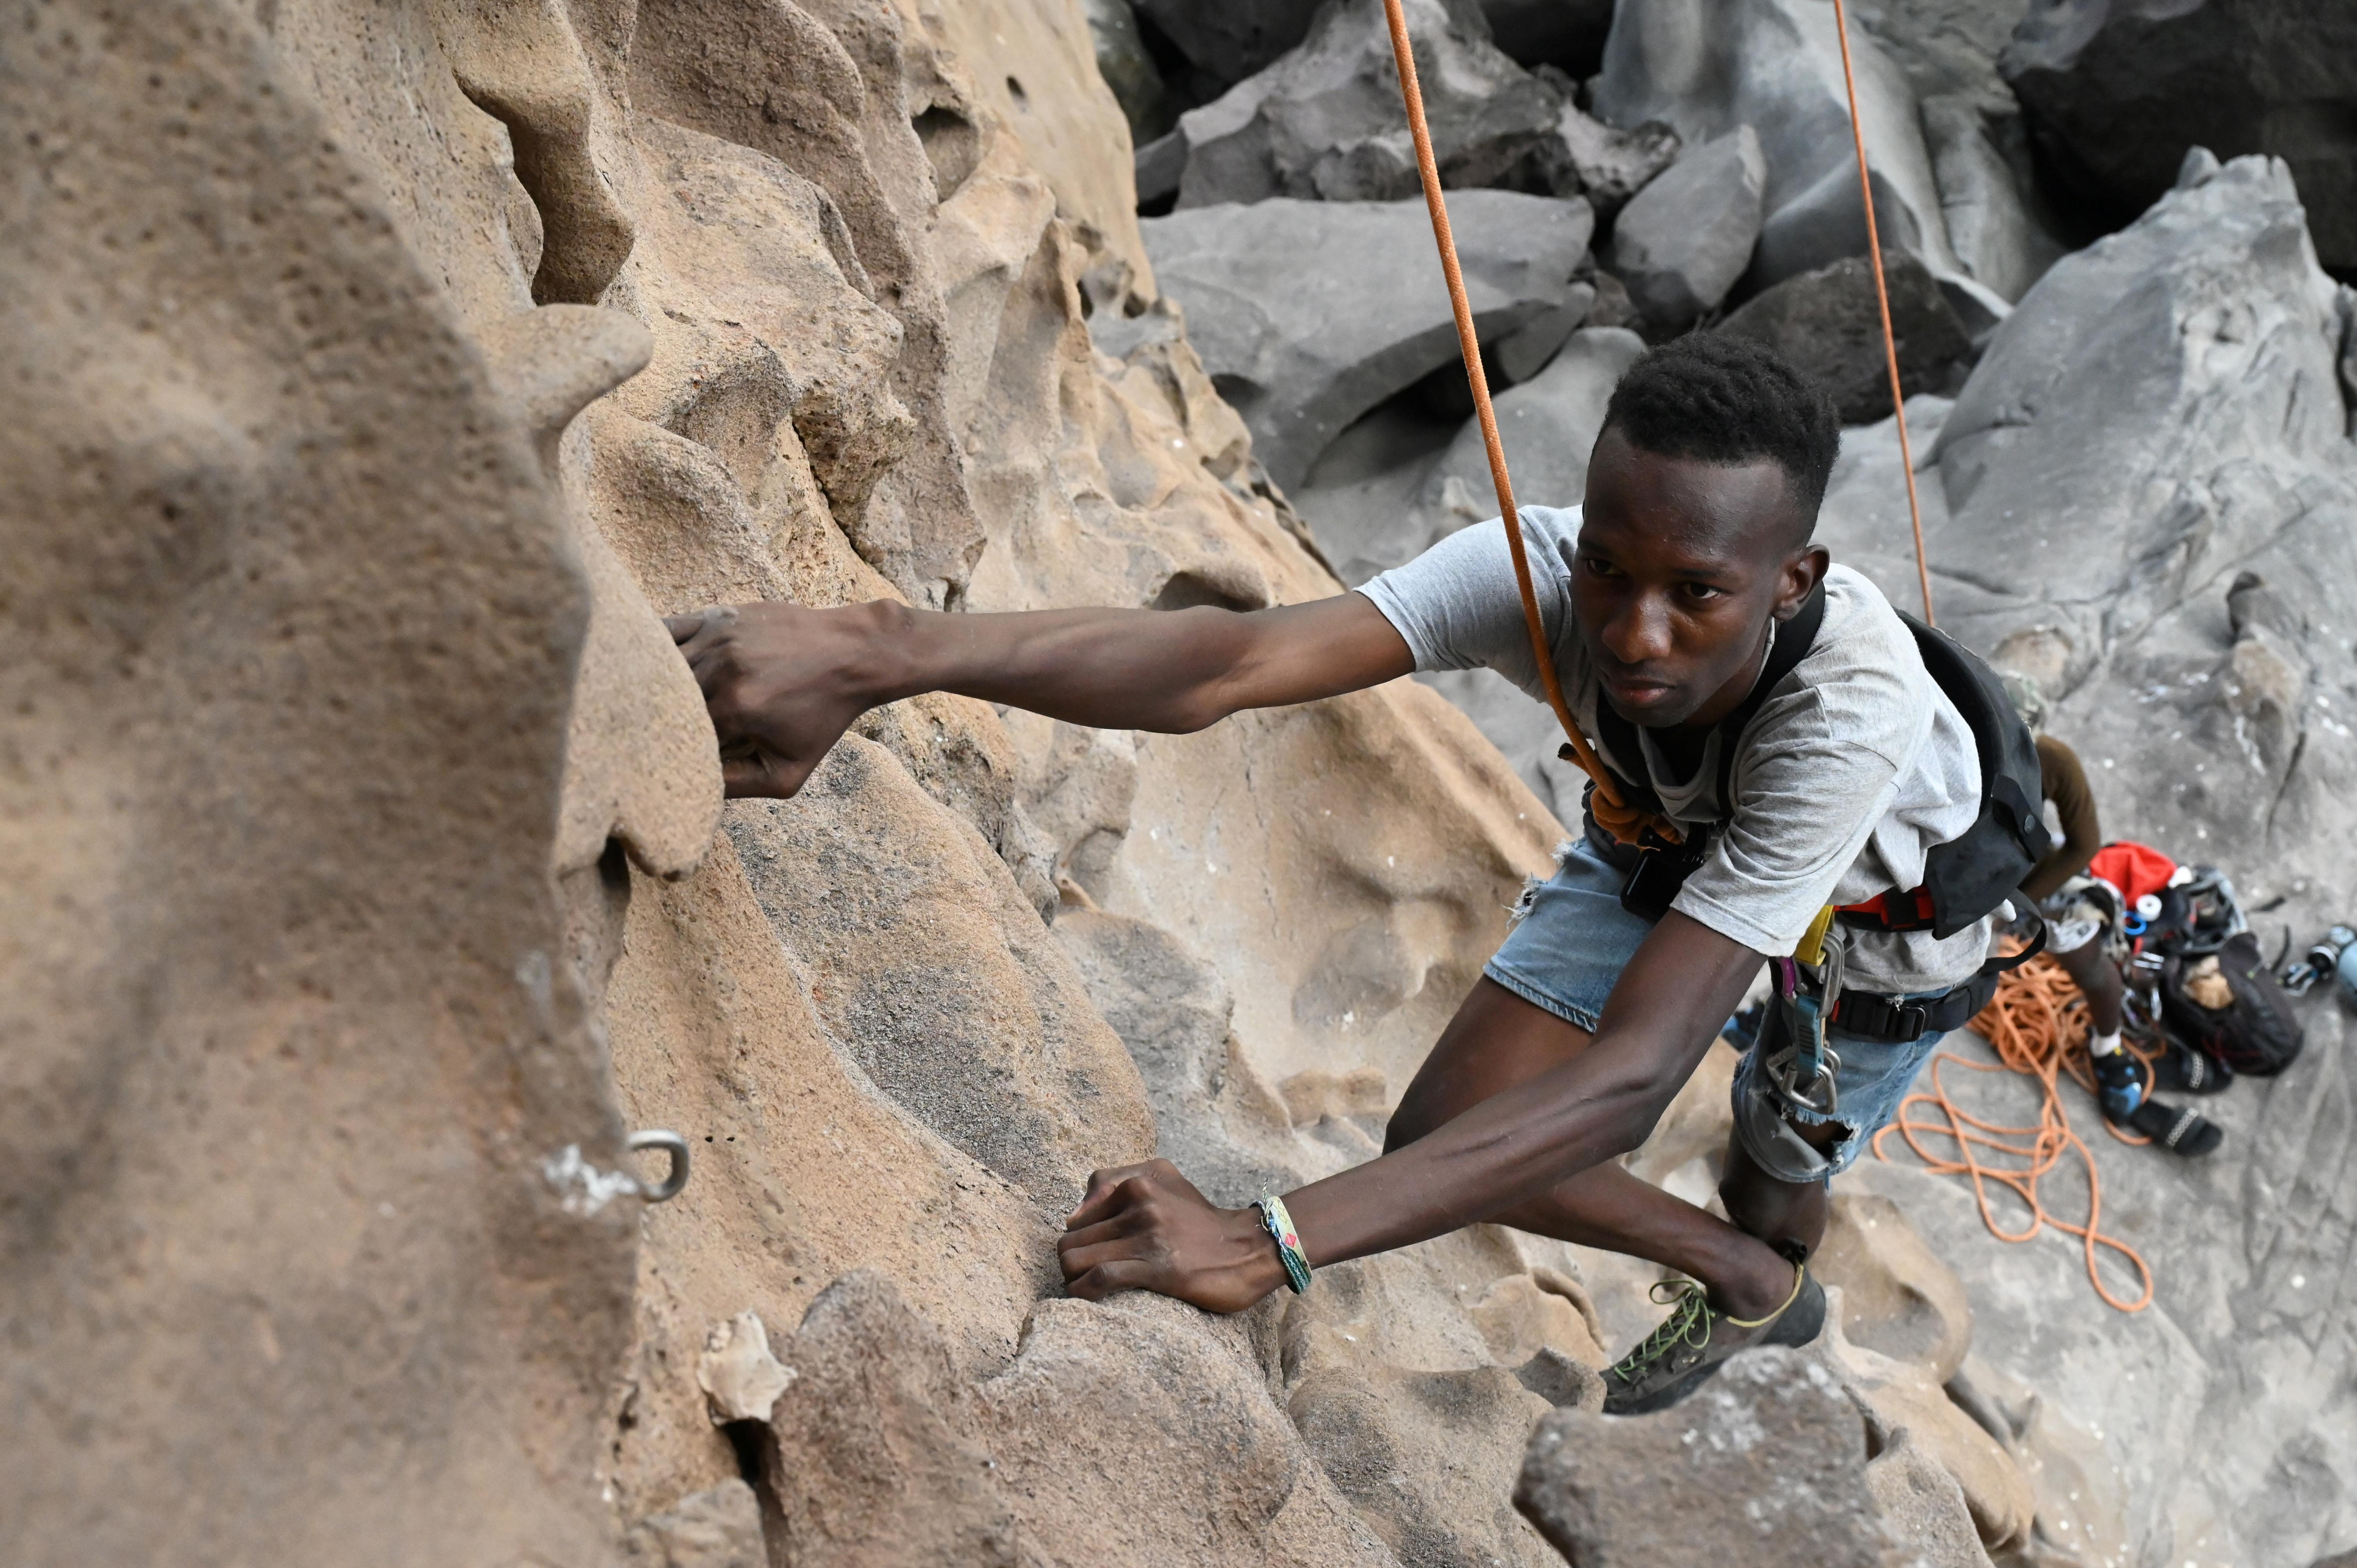 Senegalese rock climber Daouda Diallo climbs a rock wall at the Mamelles cliffs in Dakar, Senegal, July 4, 2021.   REUTERS/Cooper Inveen